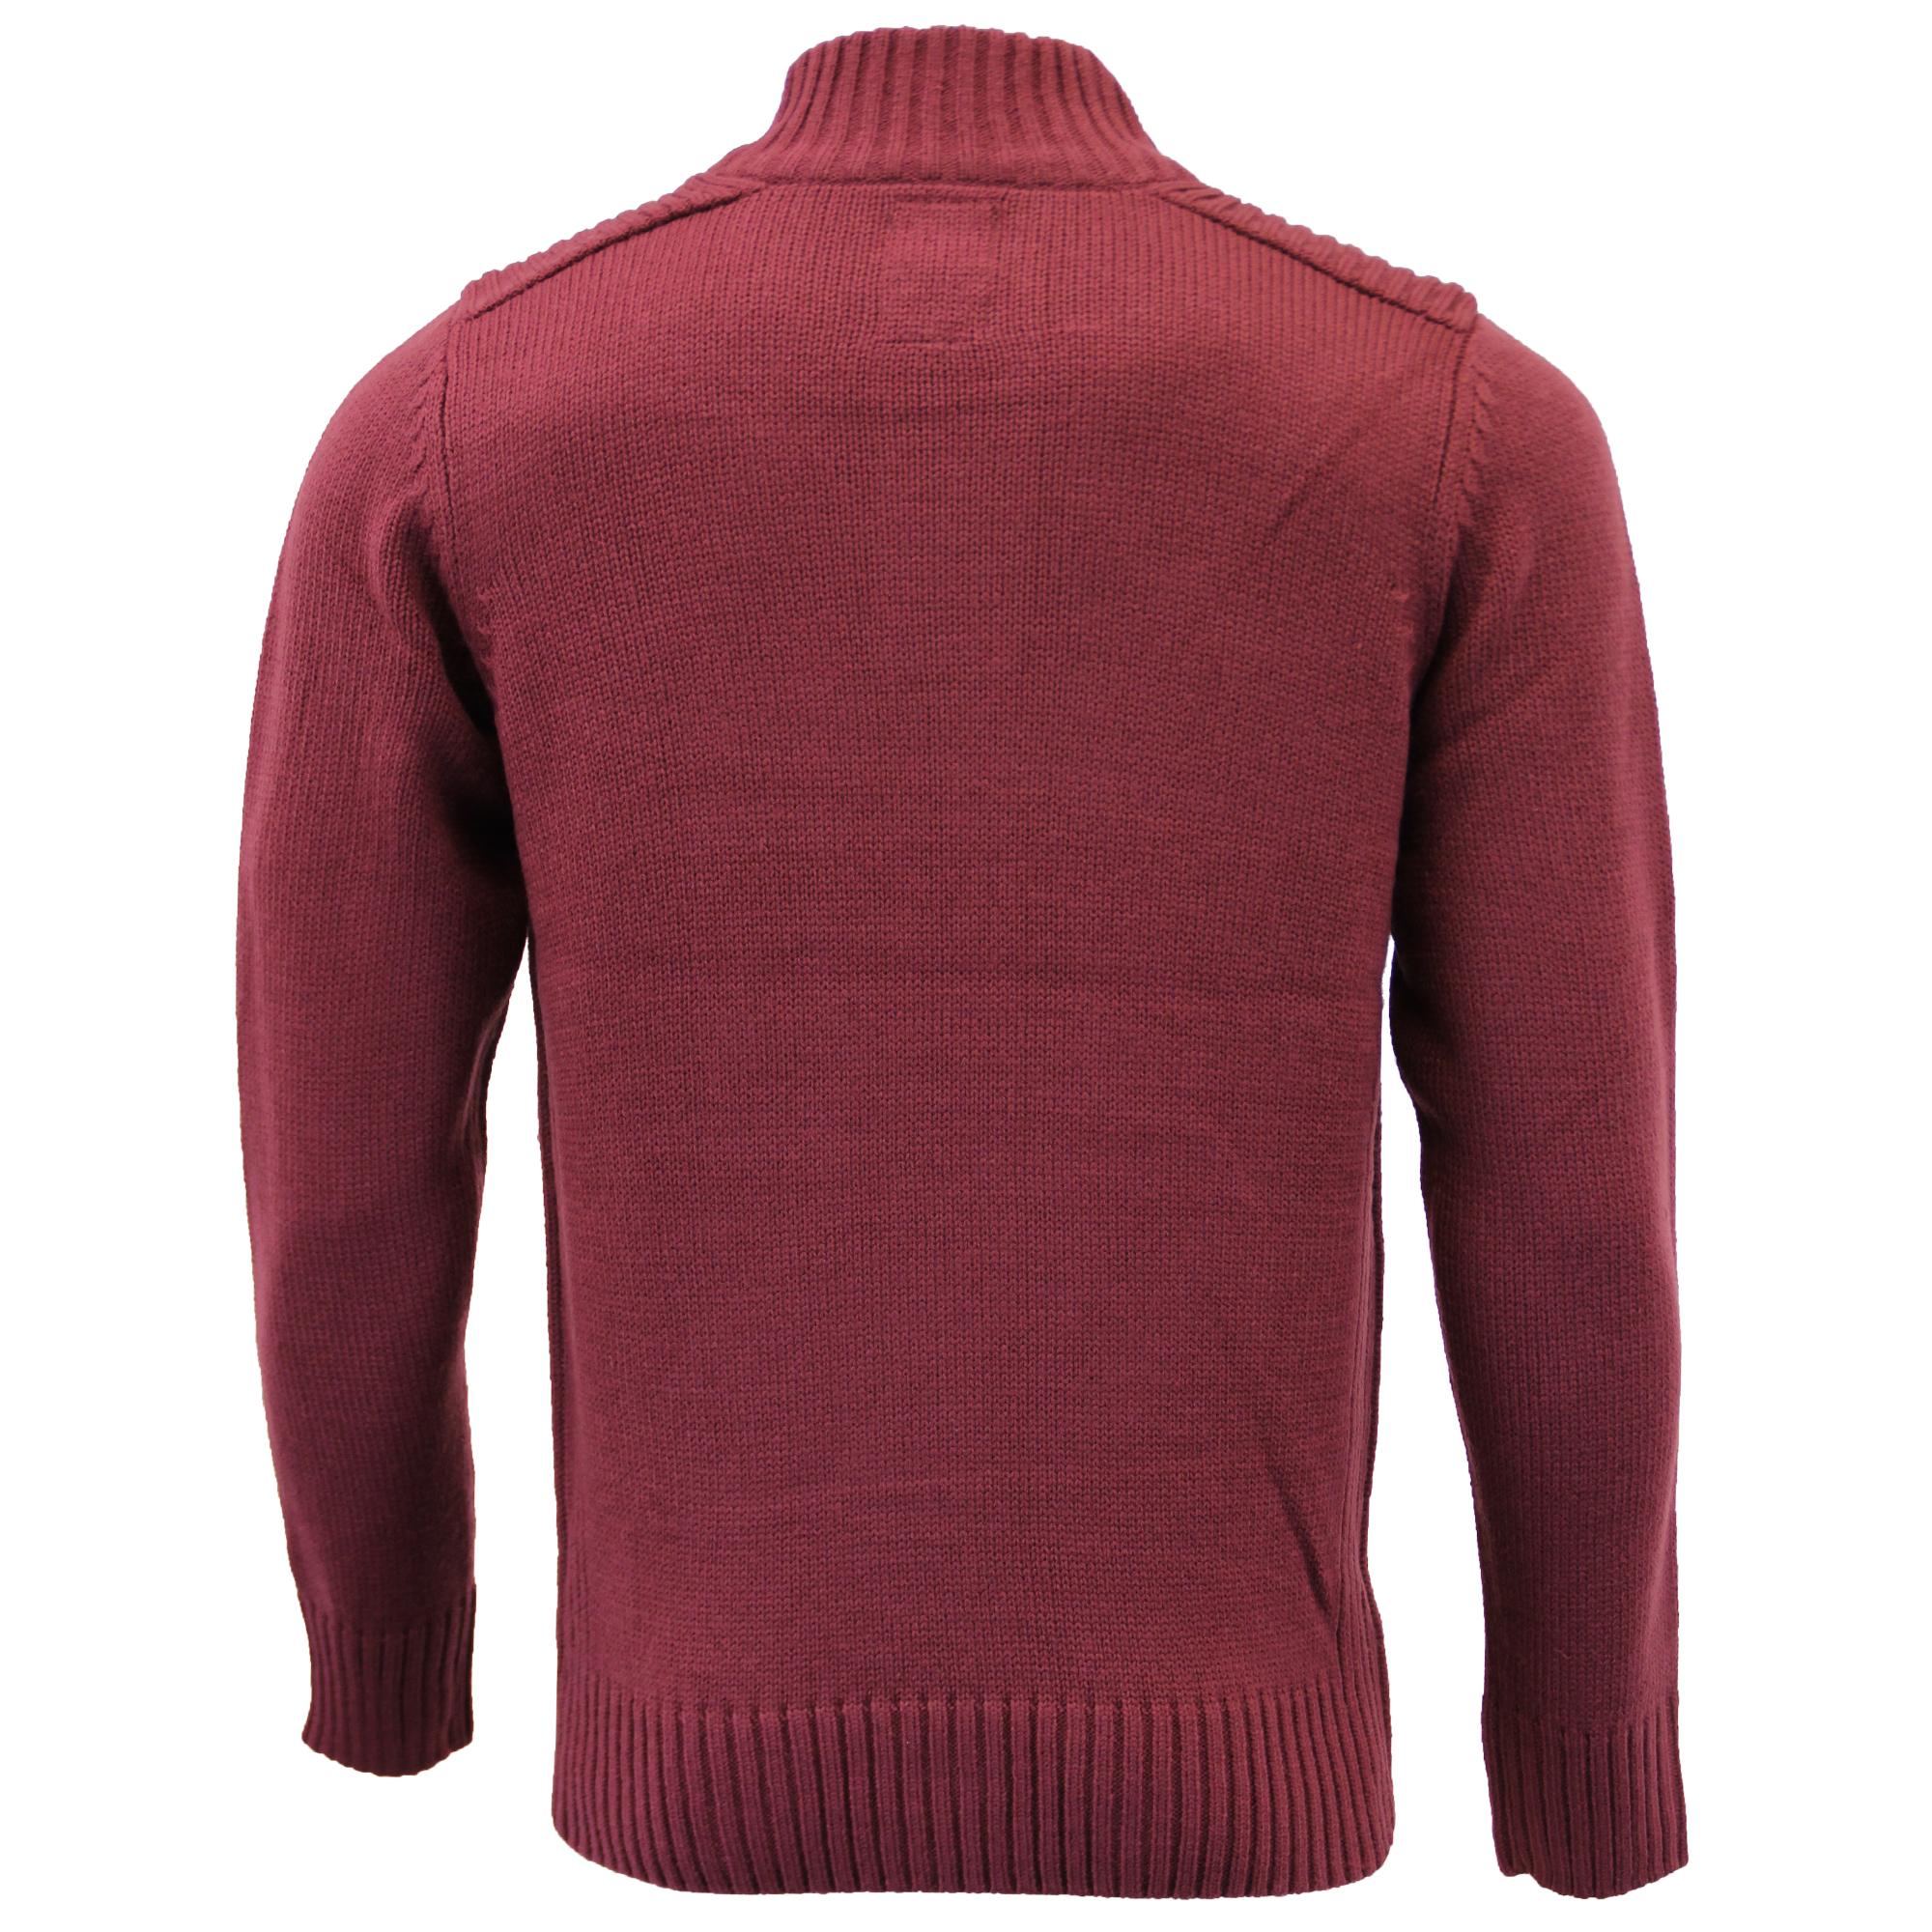 Mens-Knitted-Jumper-Kensington-Eastside-Sweater-Pullover-Top-Funnel-Neck-Winter thumbnail 8